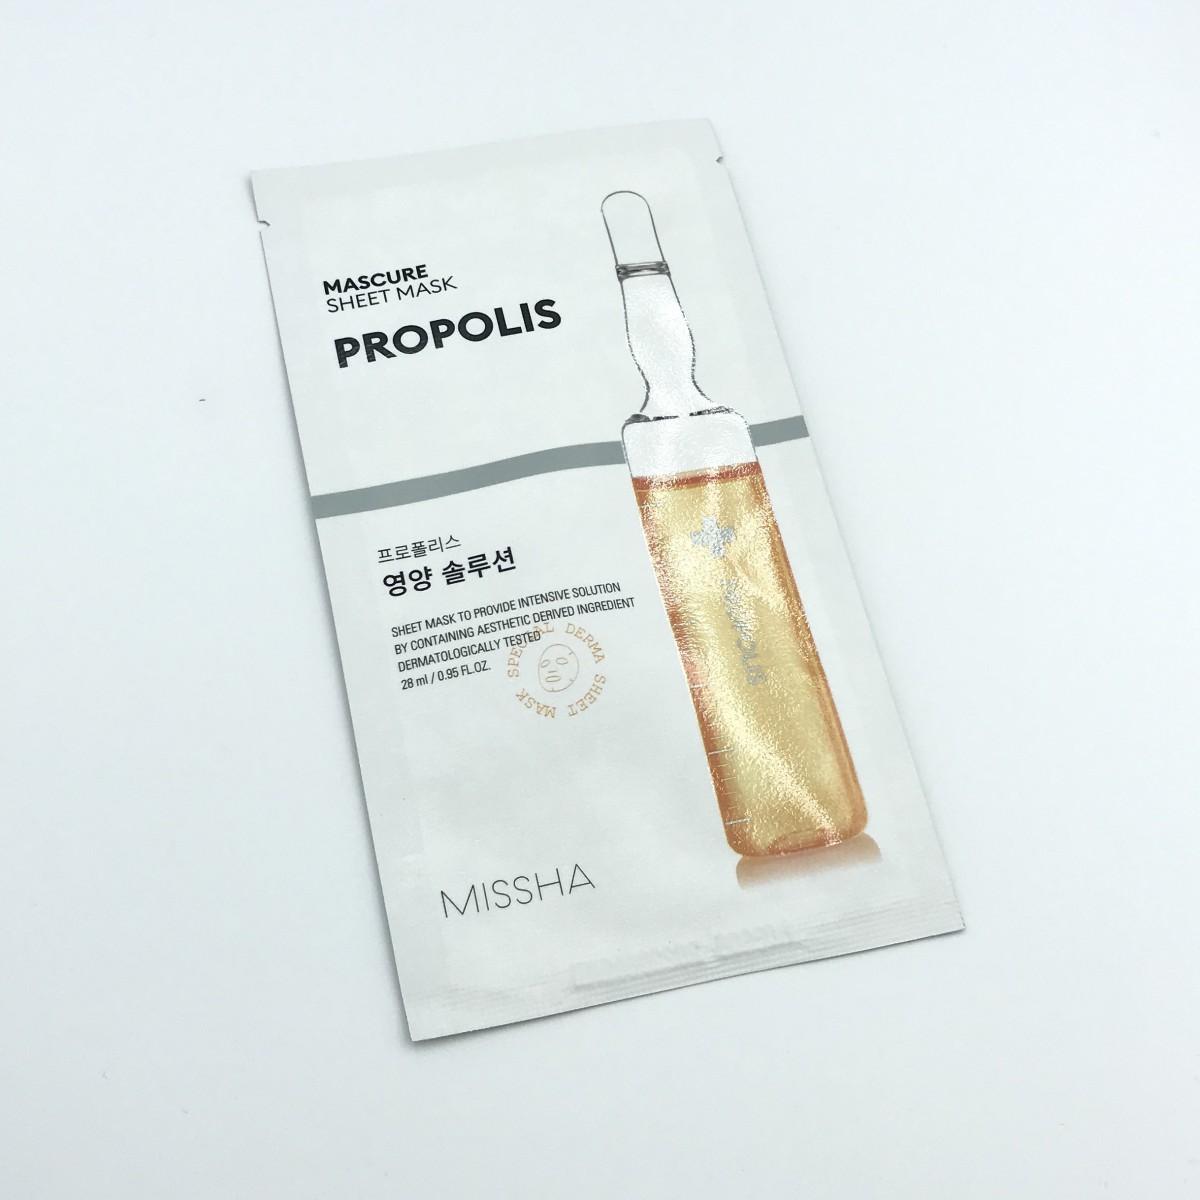 Тканевая маска для лица с прополисом MISSHA MASCURE NUTRITION SOLUTION SHEET MASK PROPOLIS - 27 мл